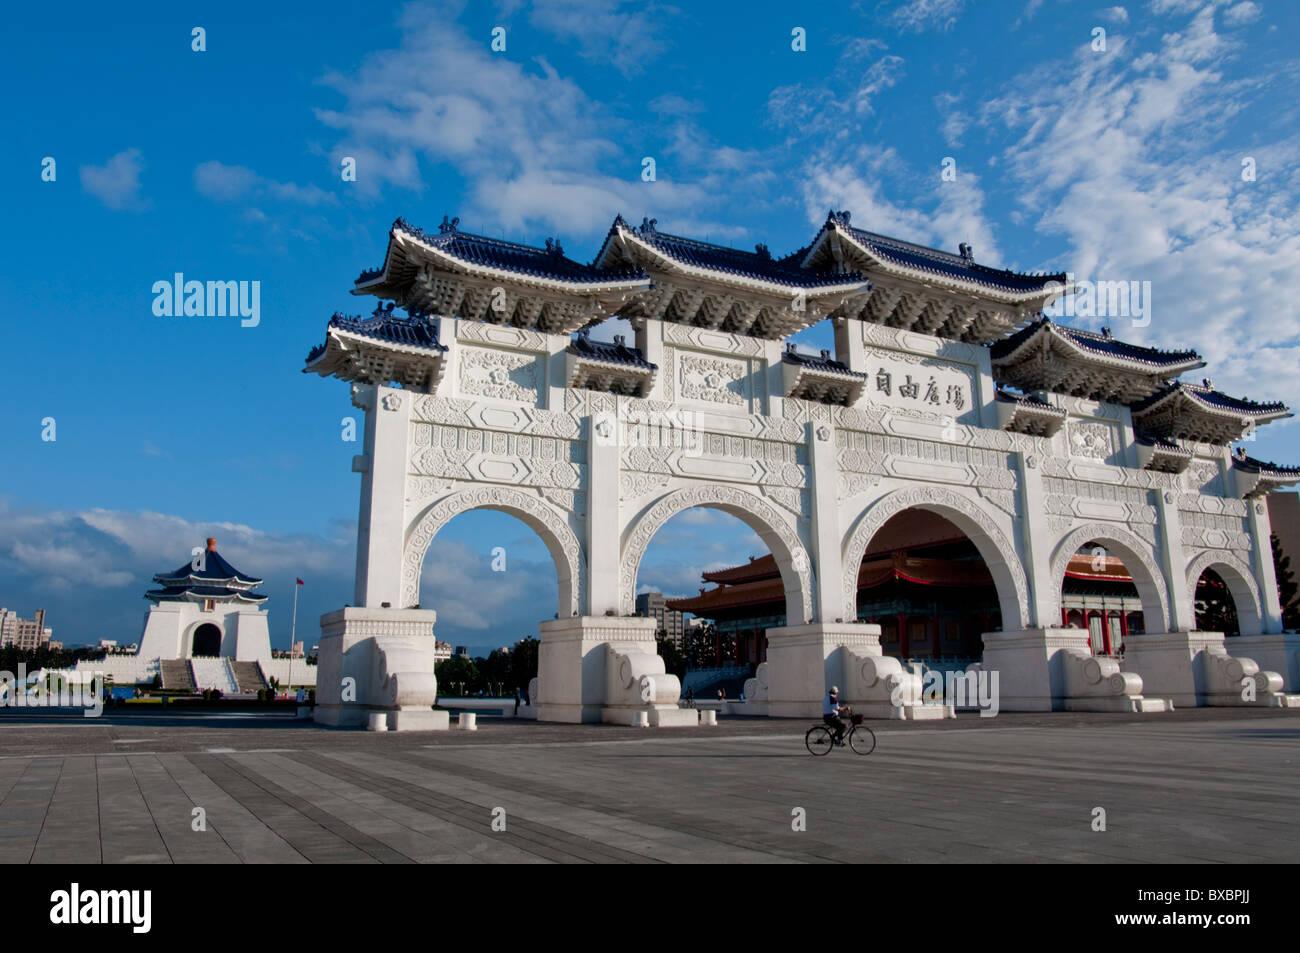 En Asie, Taiwan, Taipei, Chiang Kai Shek memorial hall arch daylight Photo Stock